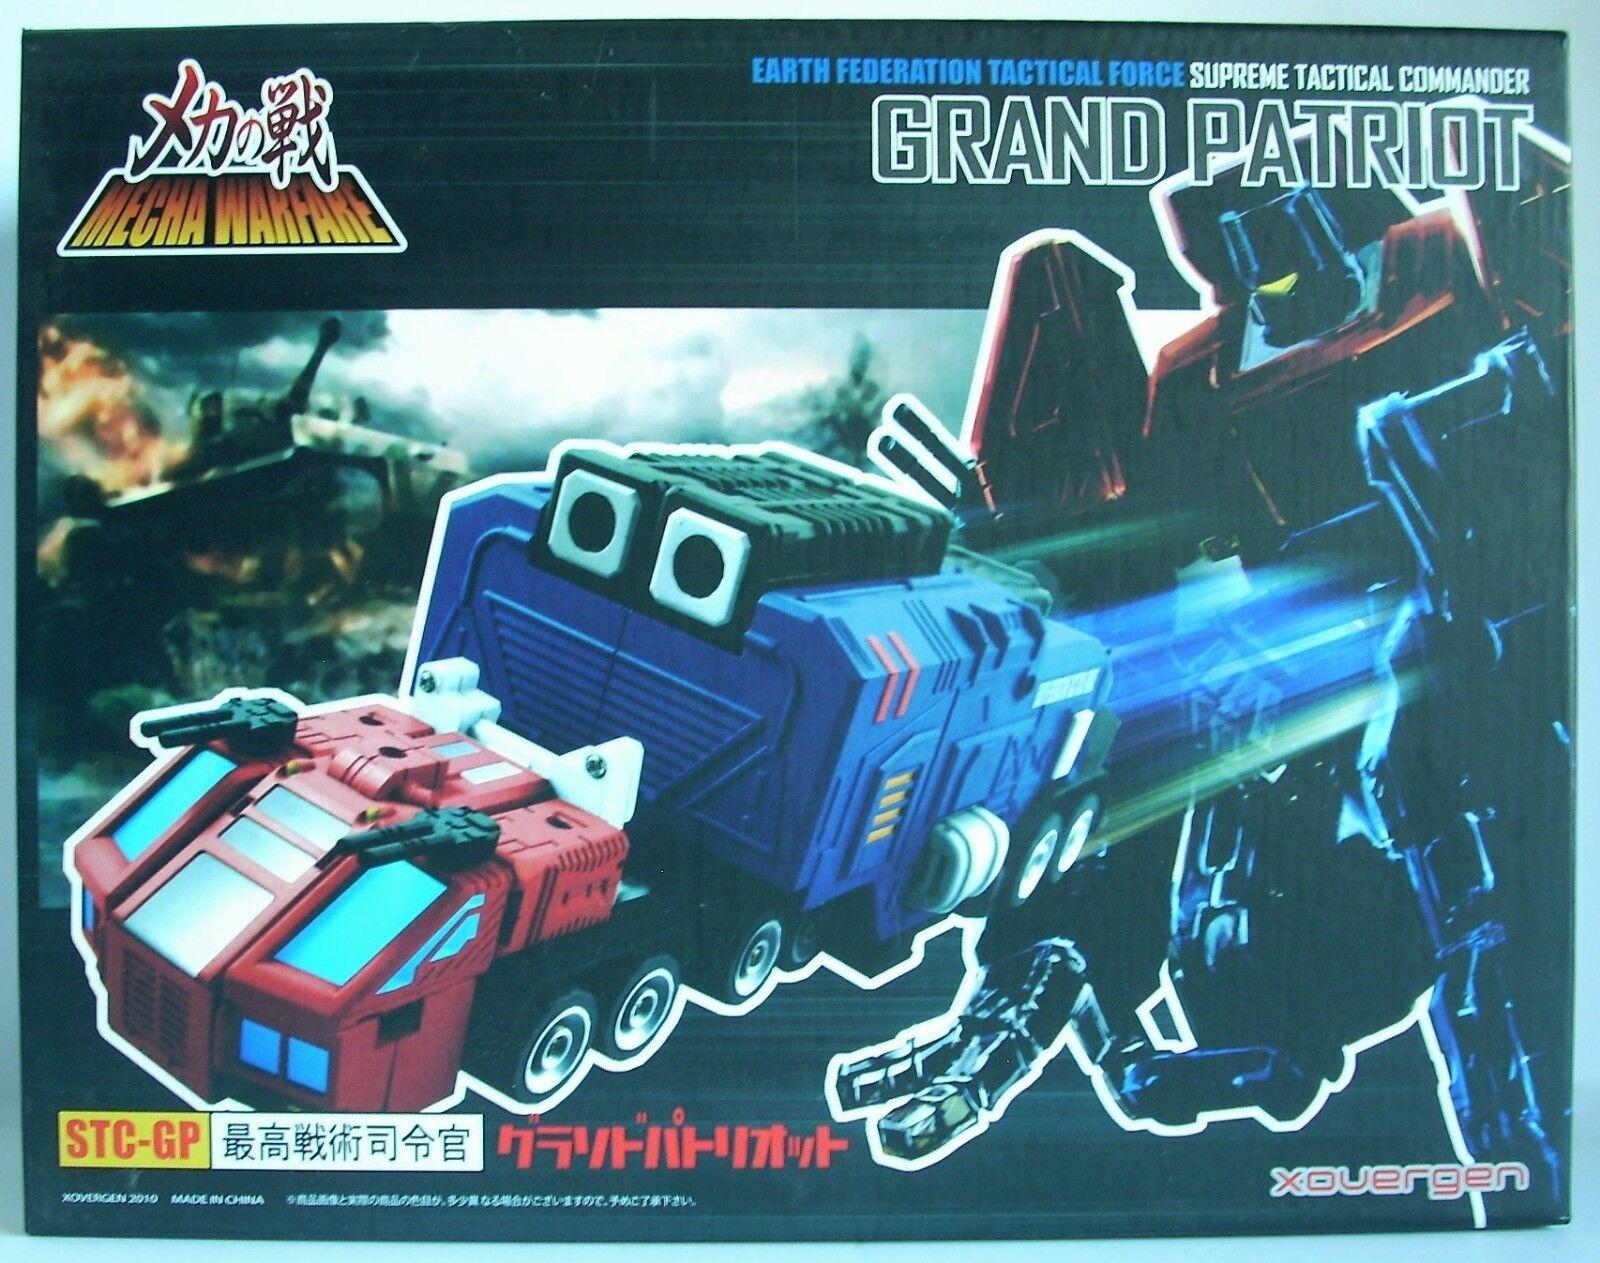 Transformers Xovergen STC-GP GRAND PATRIOT Tatical Commander - Green Variant